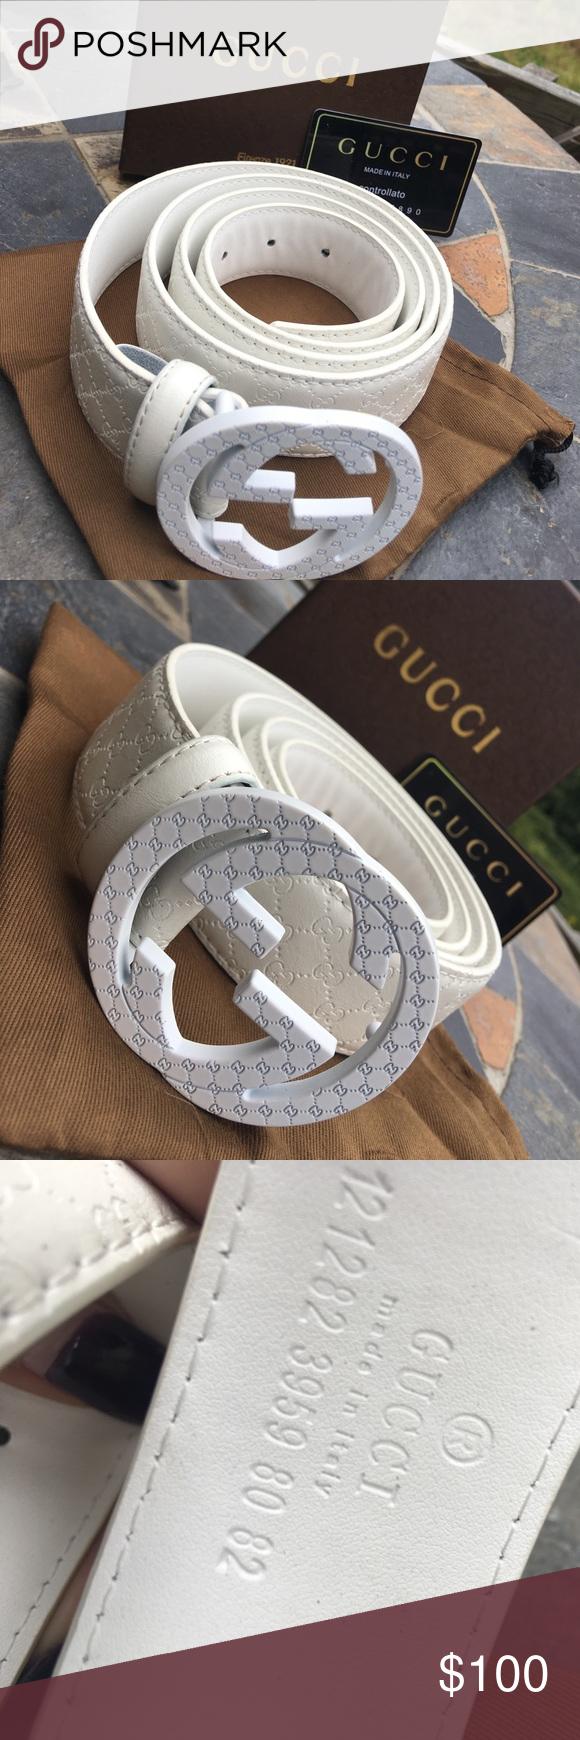 Gucci Belt All White